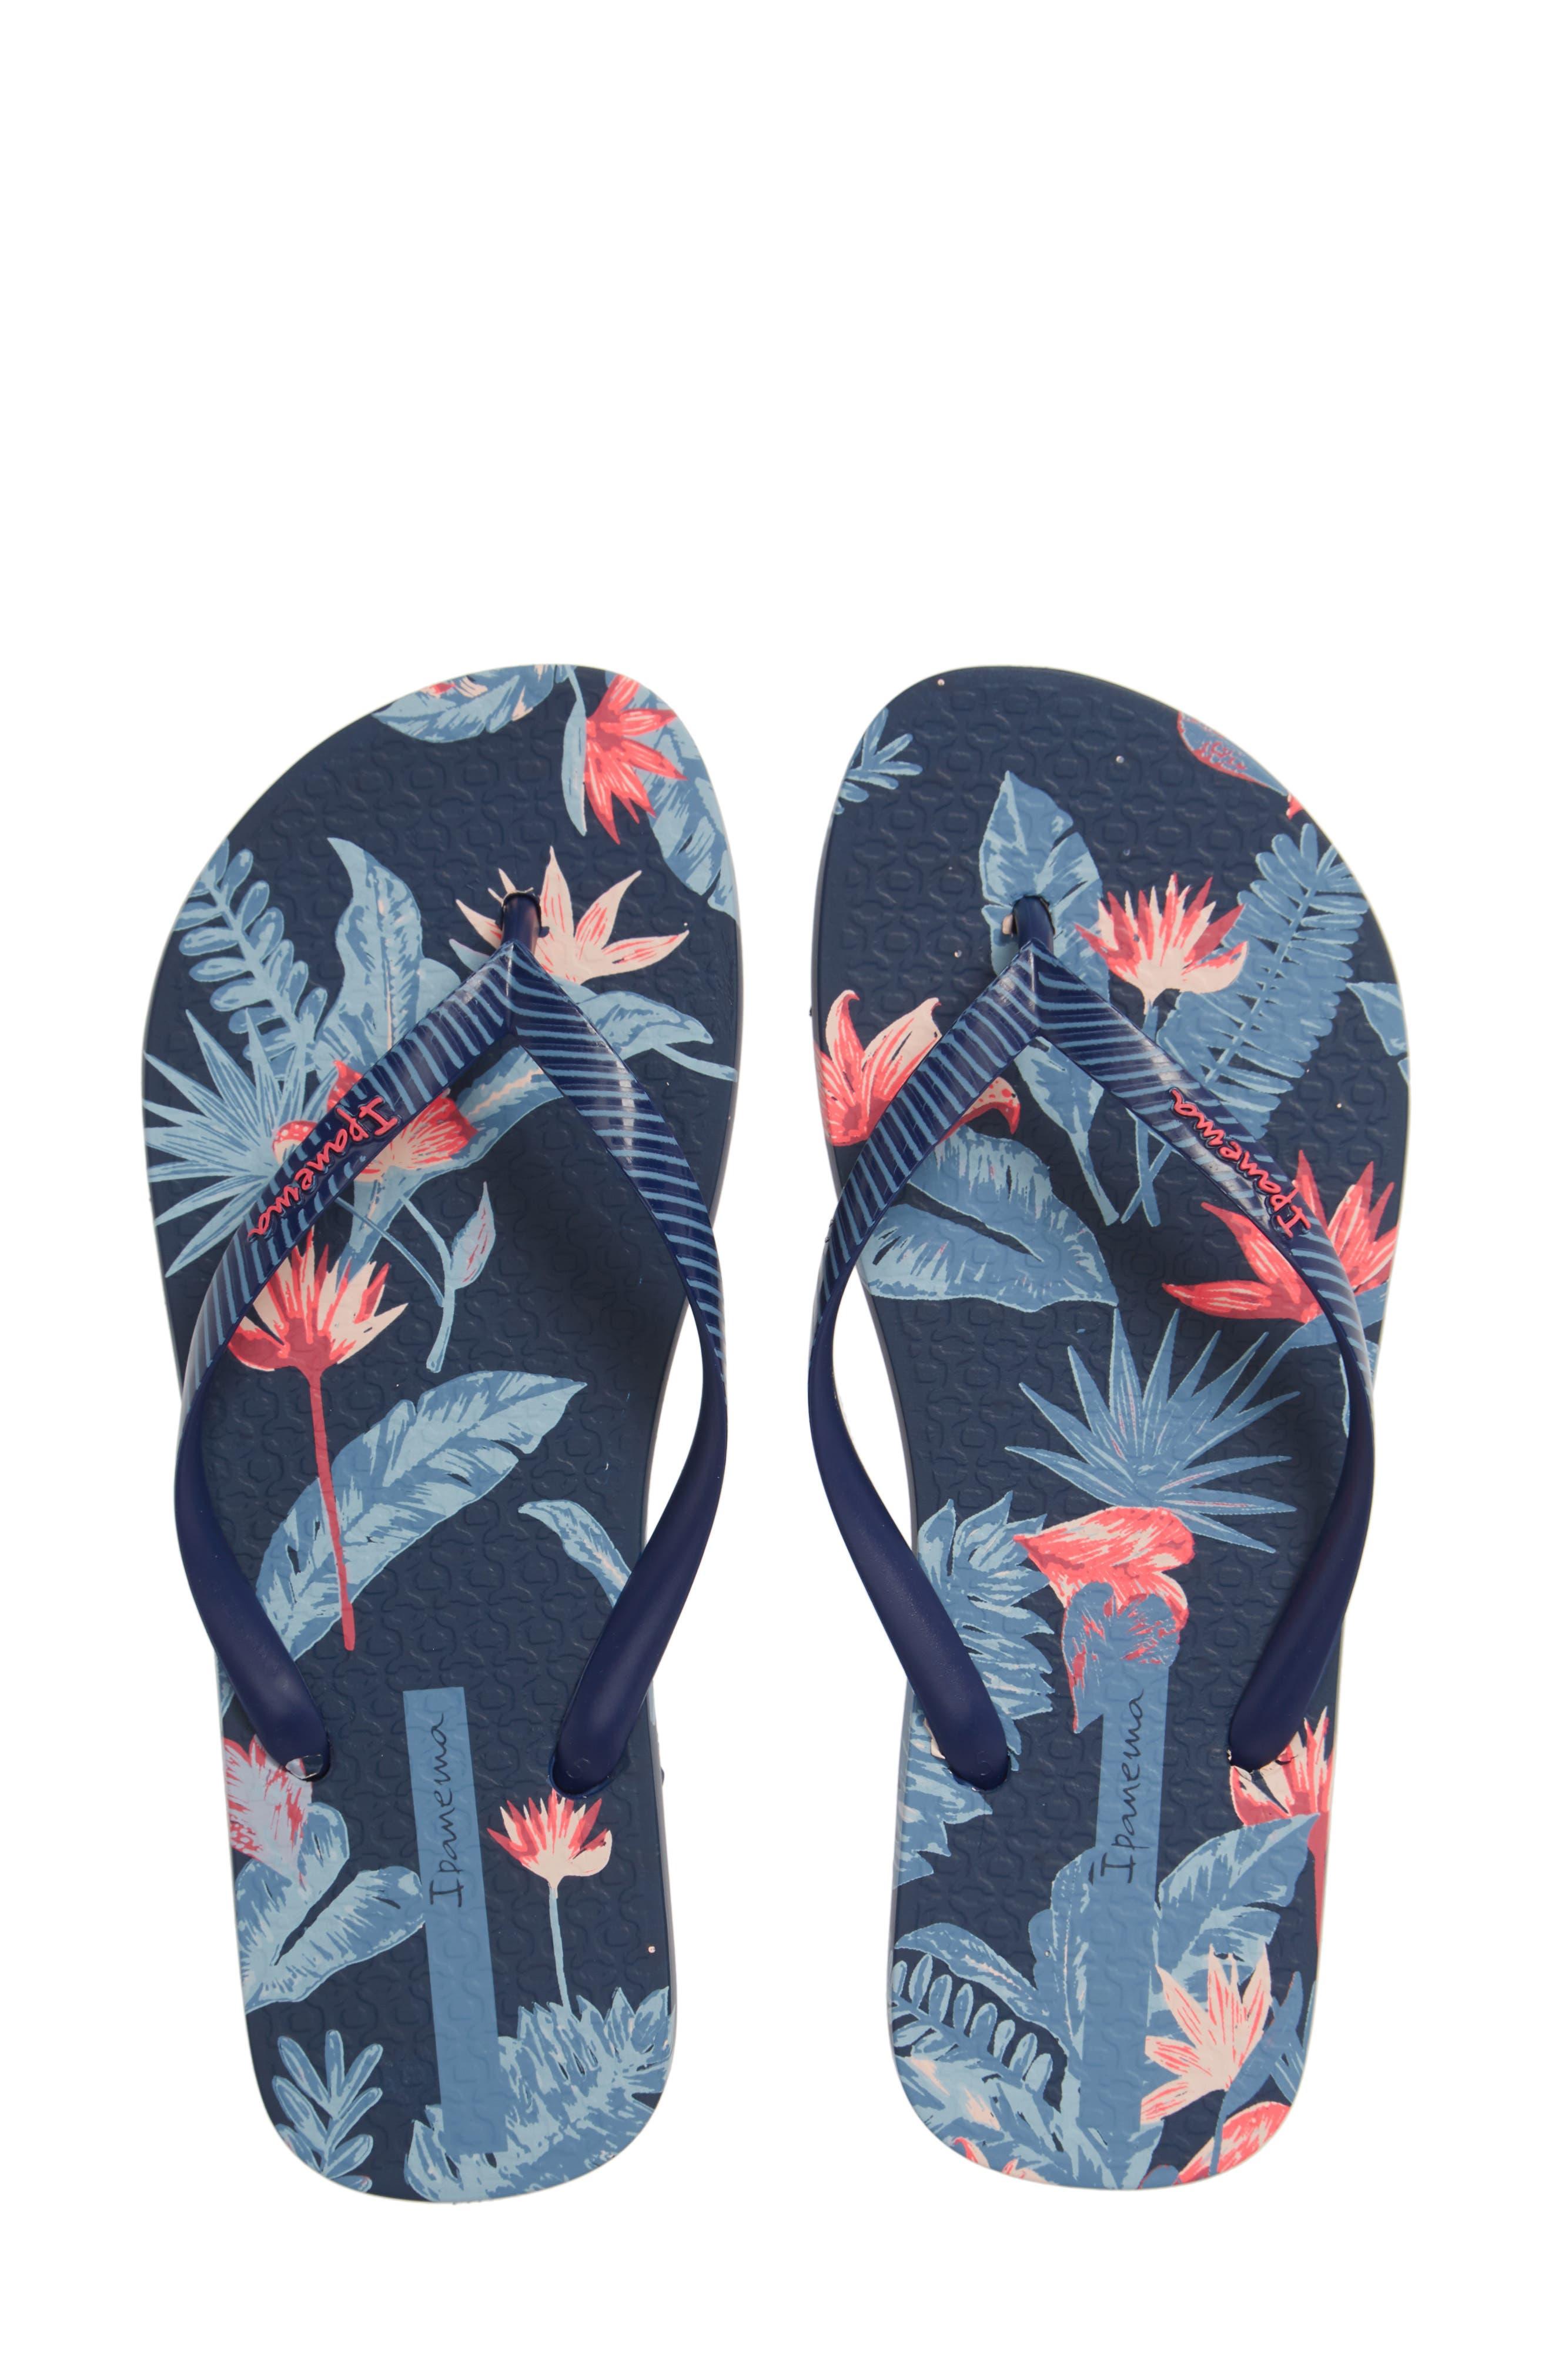 721c438e5 Ipanema Flip-Flops   Sandals for Women